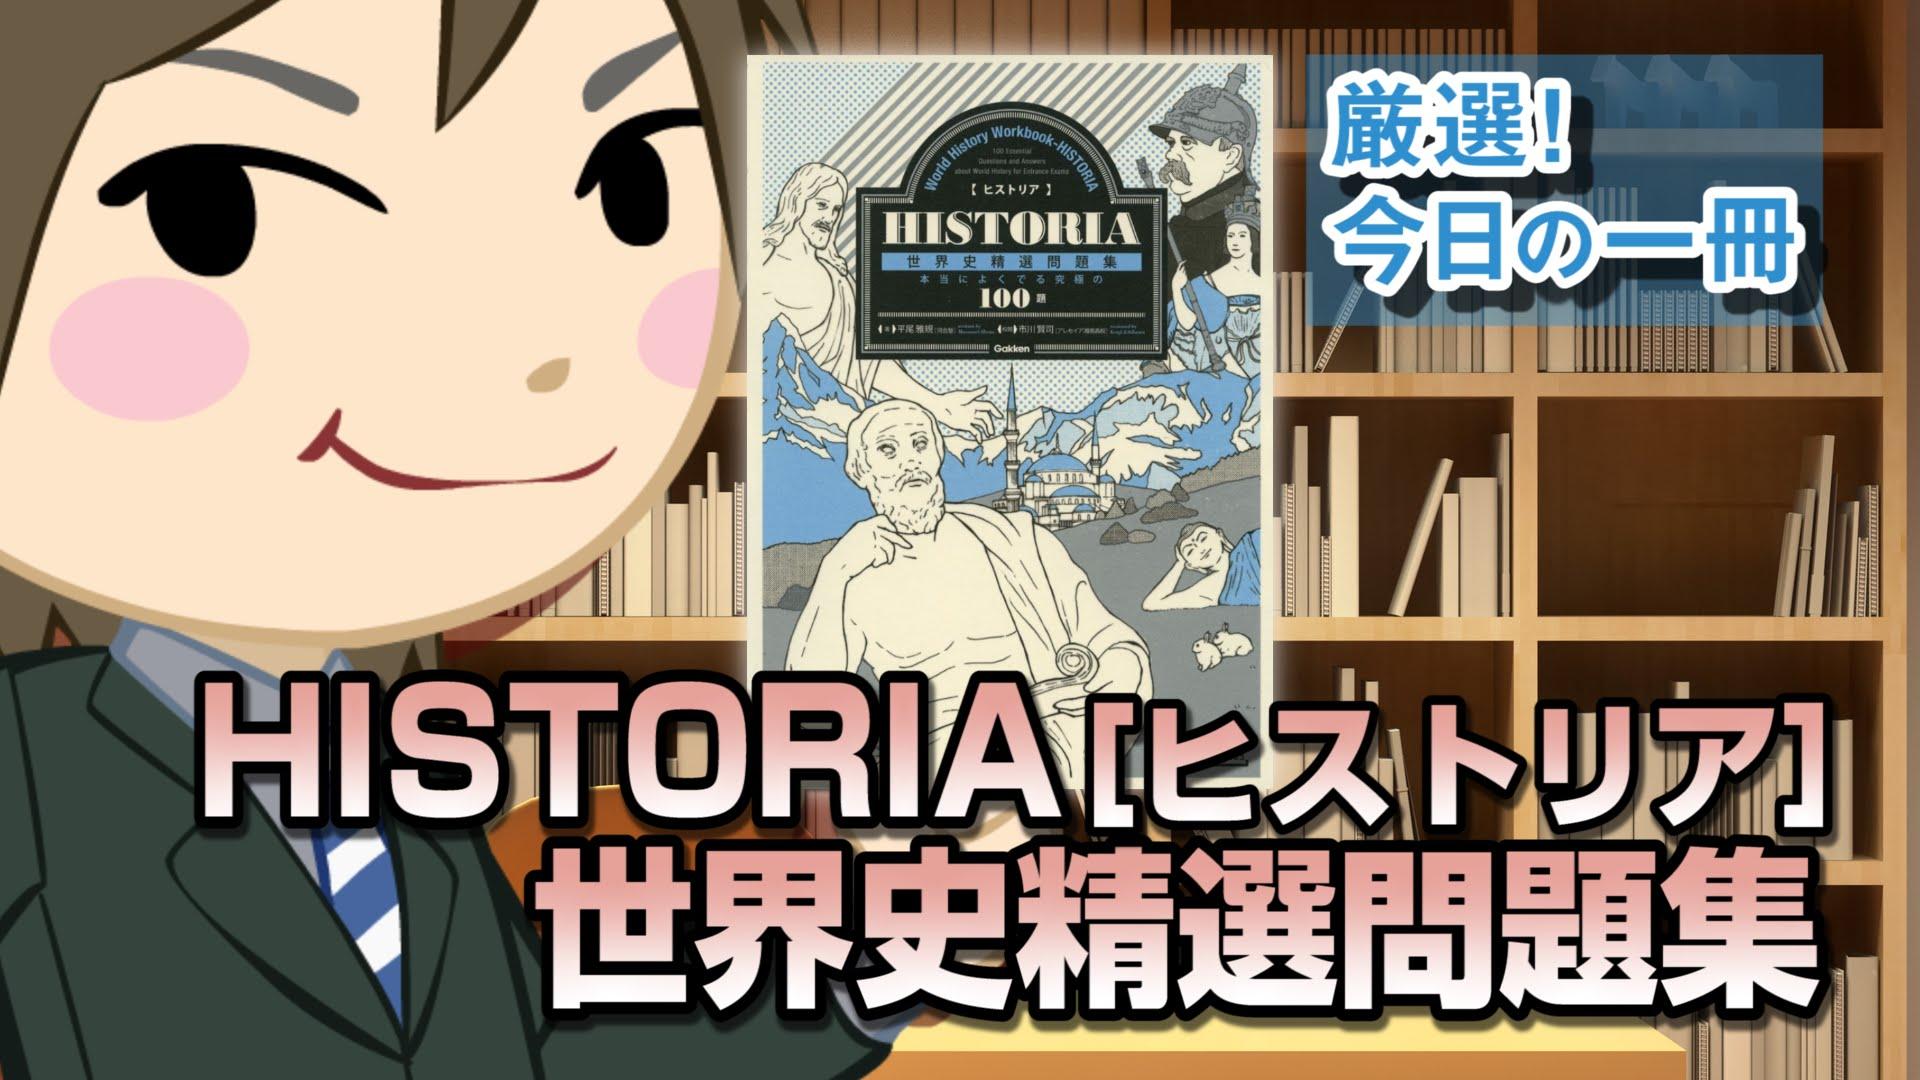 HISTORIA[ヒストリア]世界史精選問題集|武田塾厳選! 今日の一冊